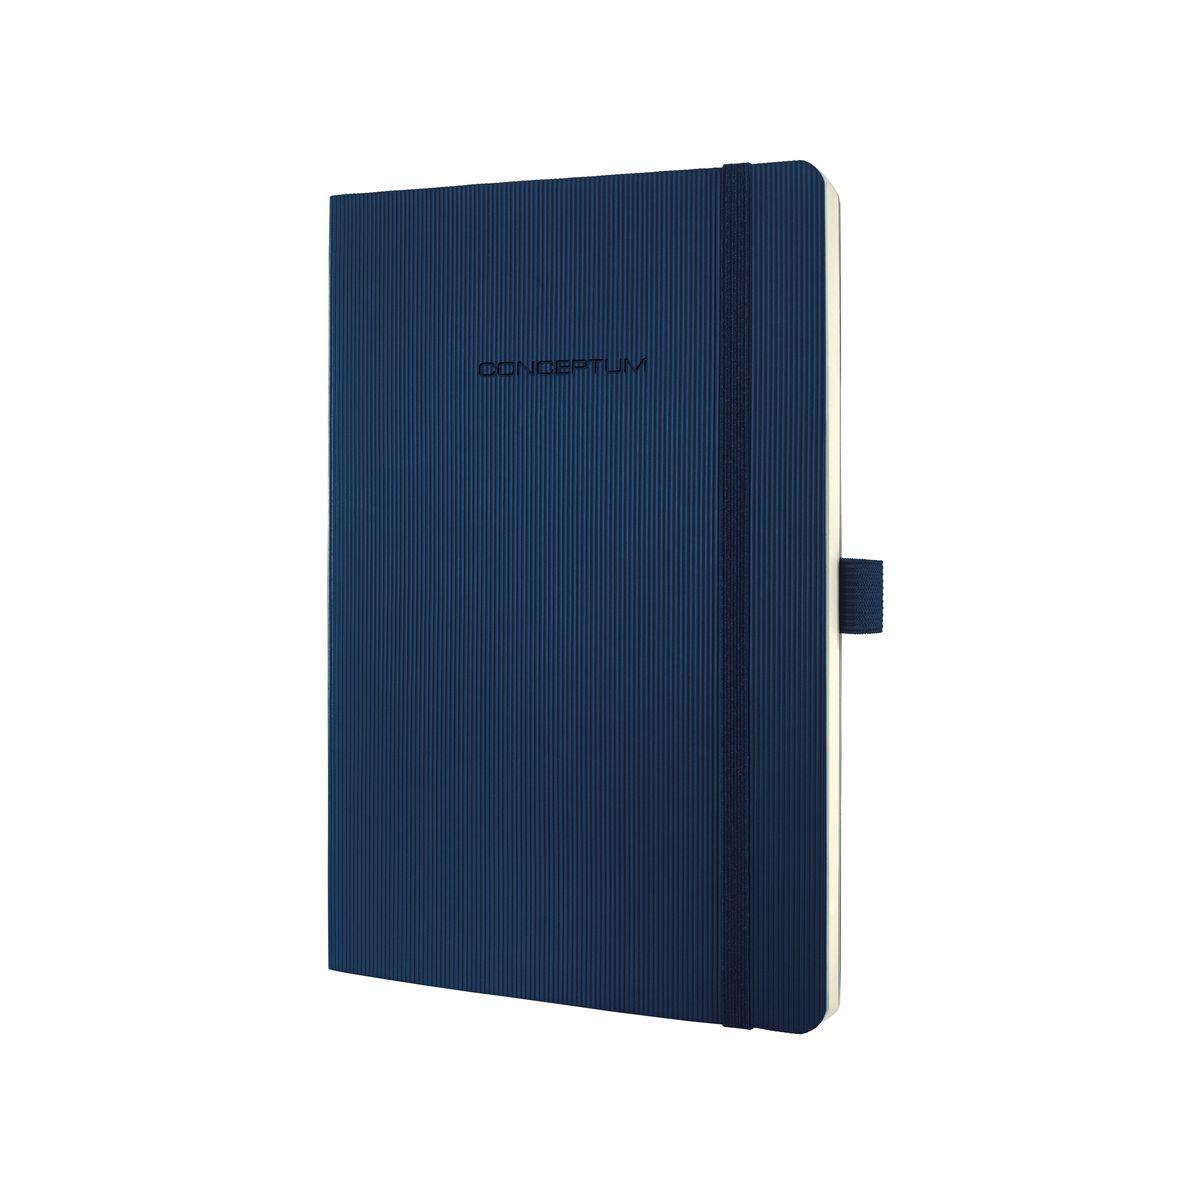 Sigel Conceptum writing notebook A5 194 sheets Blue